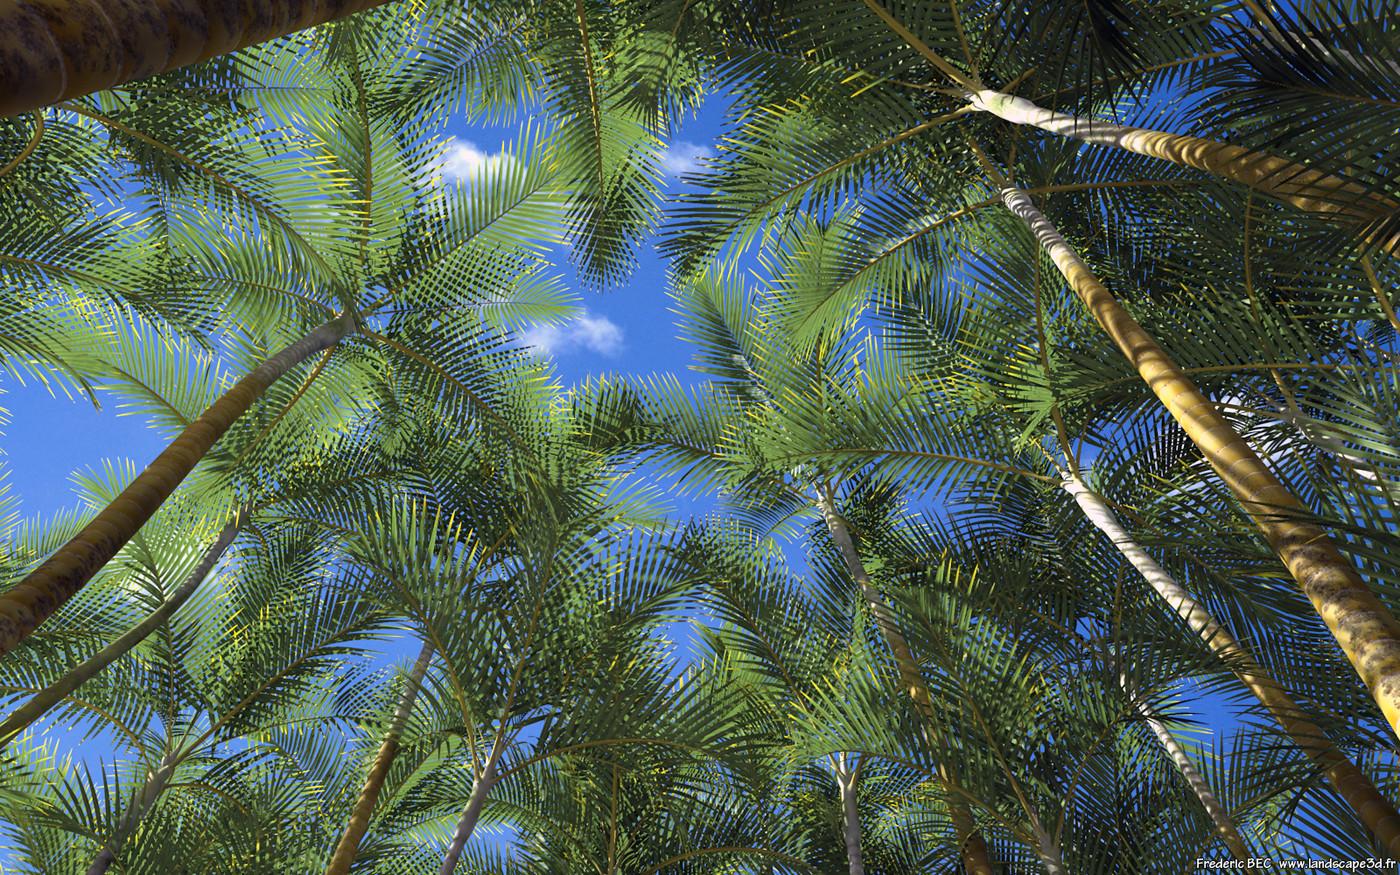 Frédéric Bec - Dypsis lutescens (Chrysalidocarpus ...